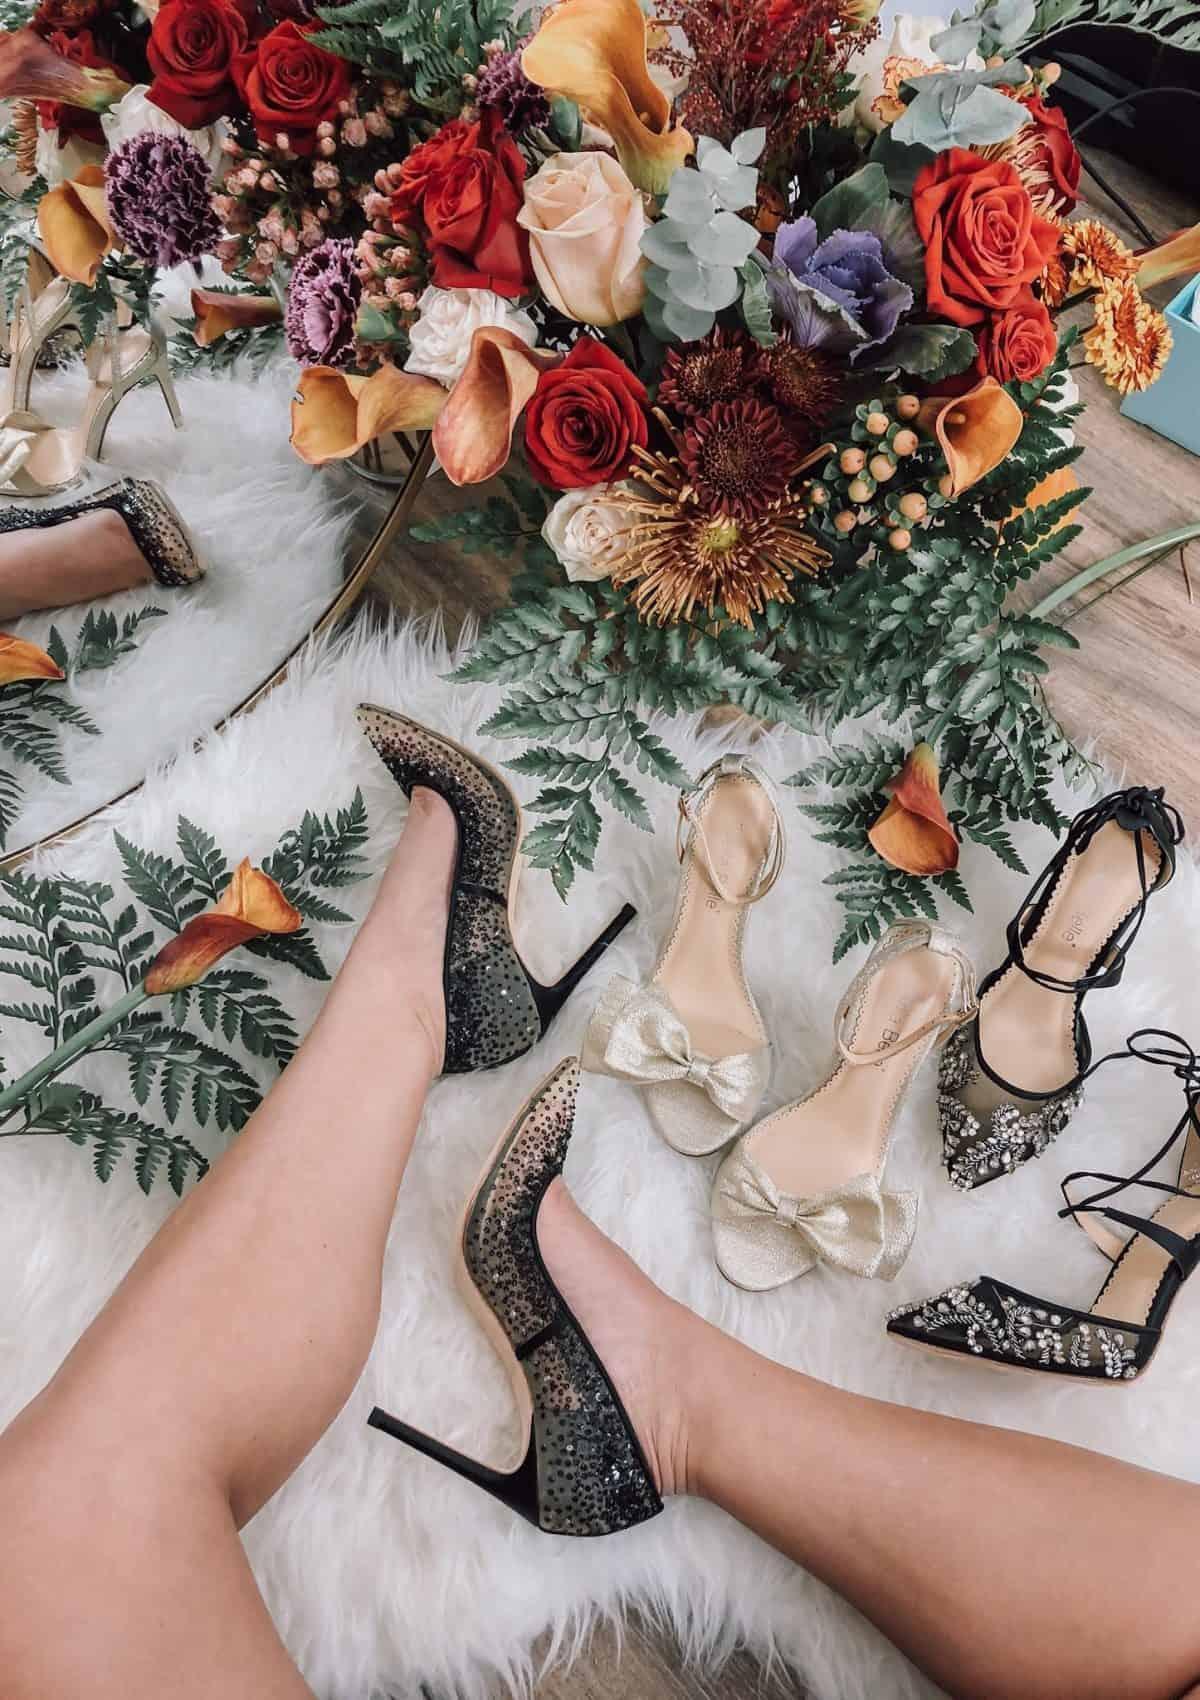 Calling All Brides, Bridesmaids & Wedding Guests!